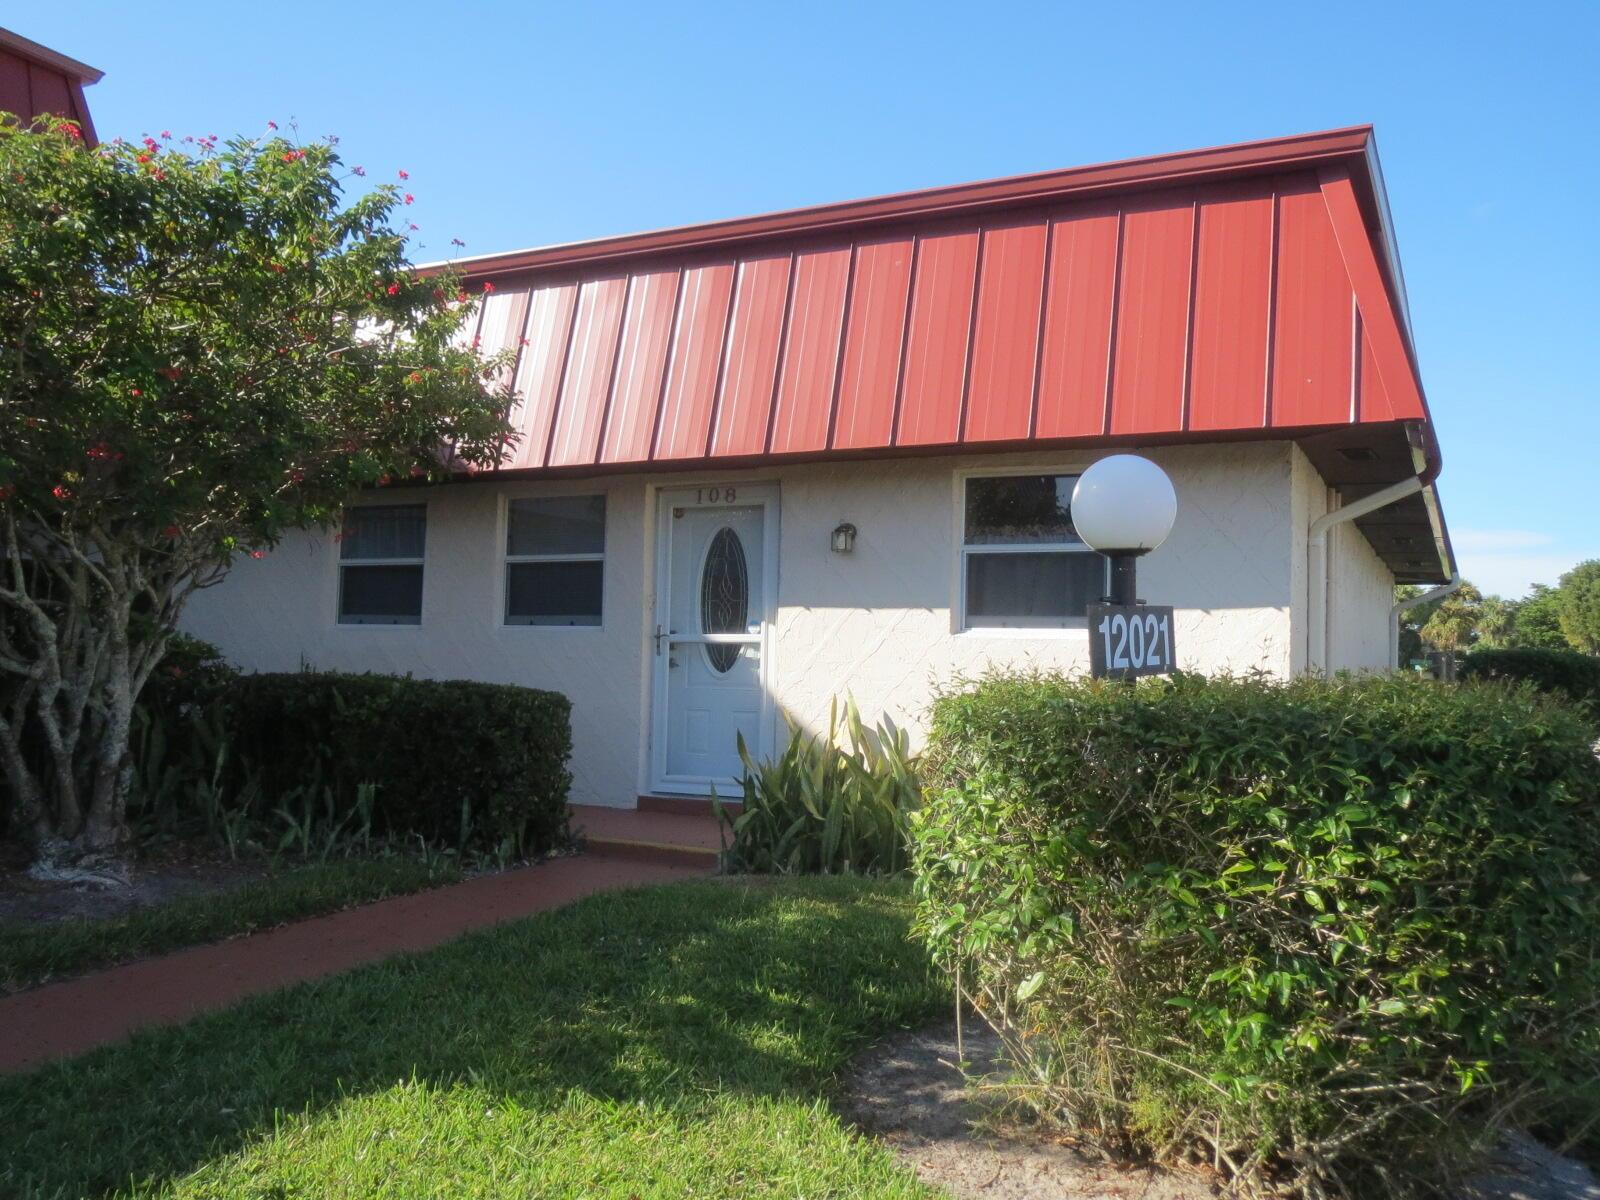 12021 Greenway Unit 108, Royal Palm Beach, Florida 33411